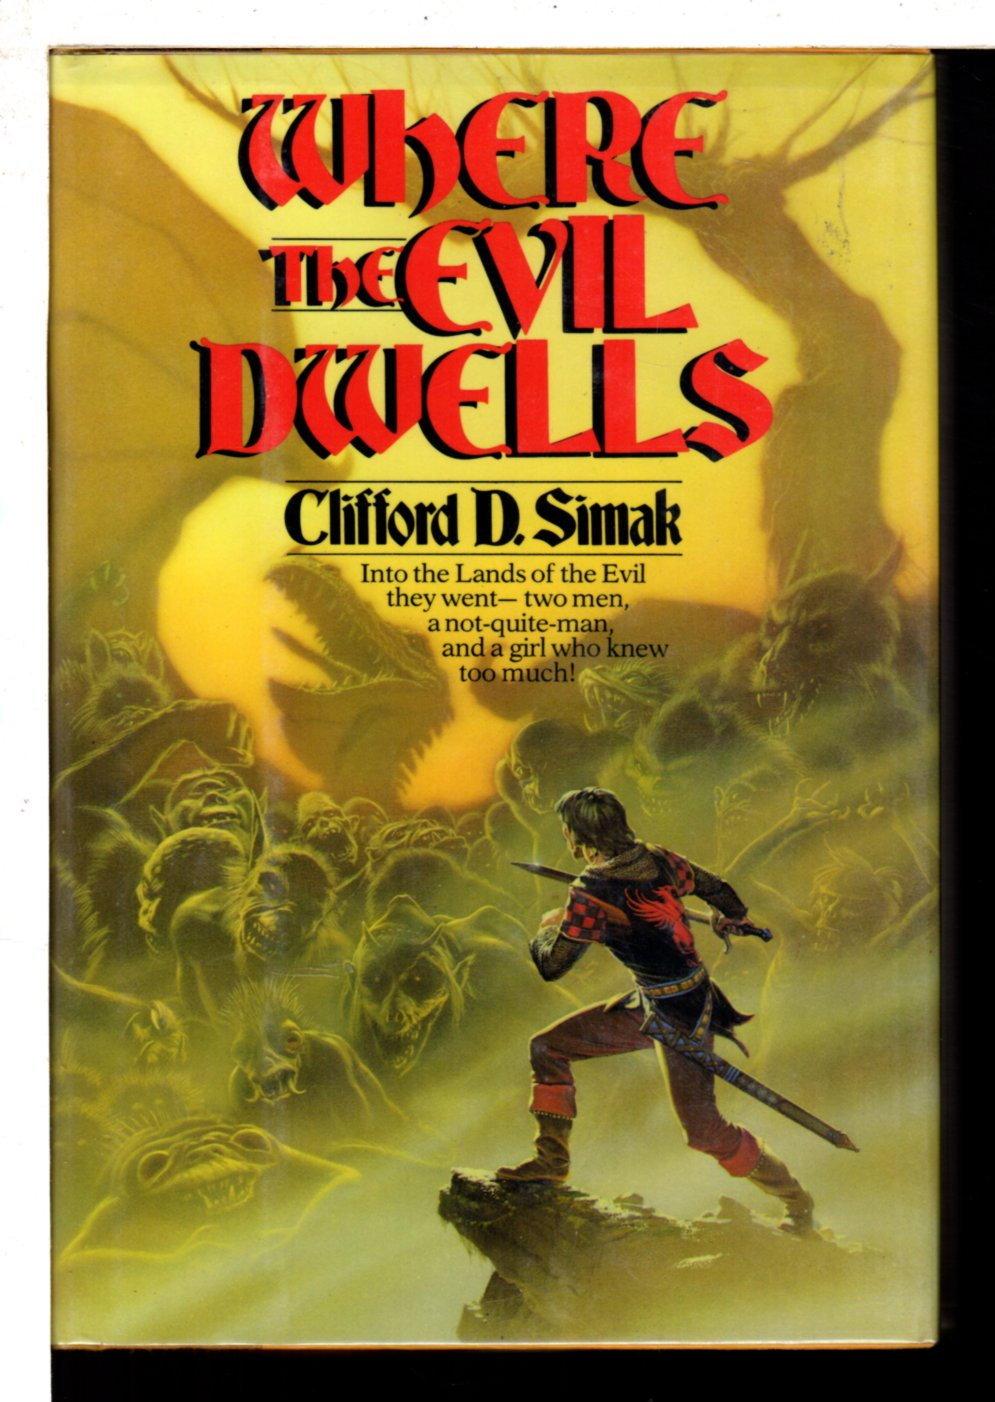 SIMAK, CLIFFORD D. - WHERE THE EVIL DWELLS.